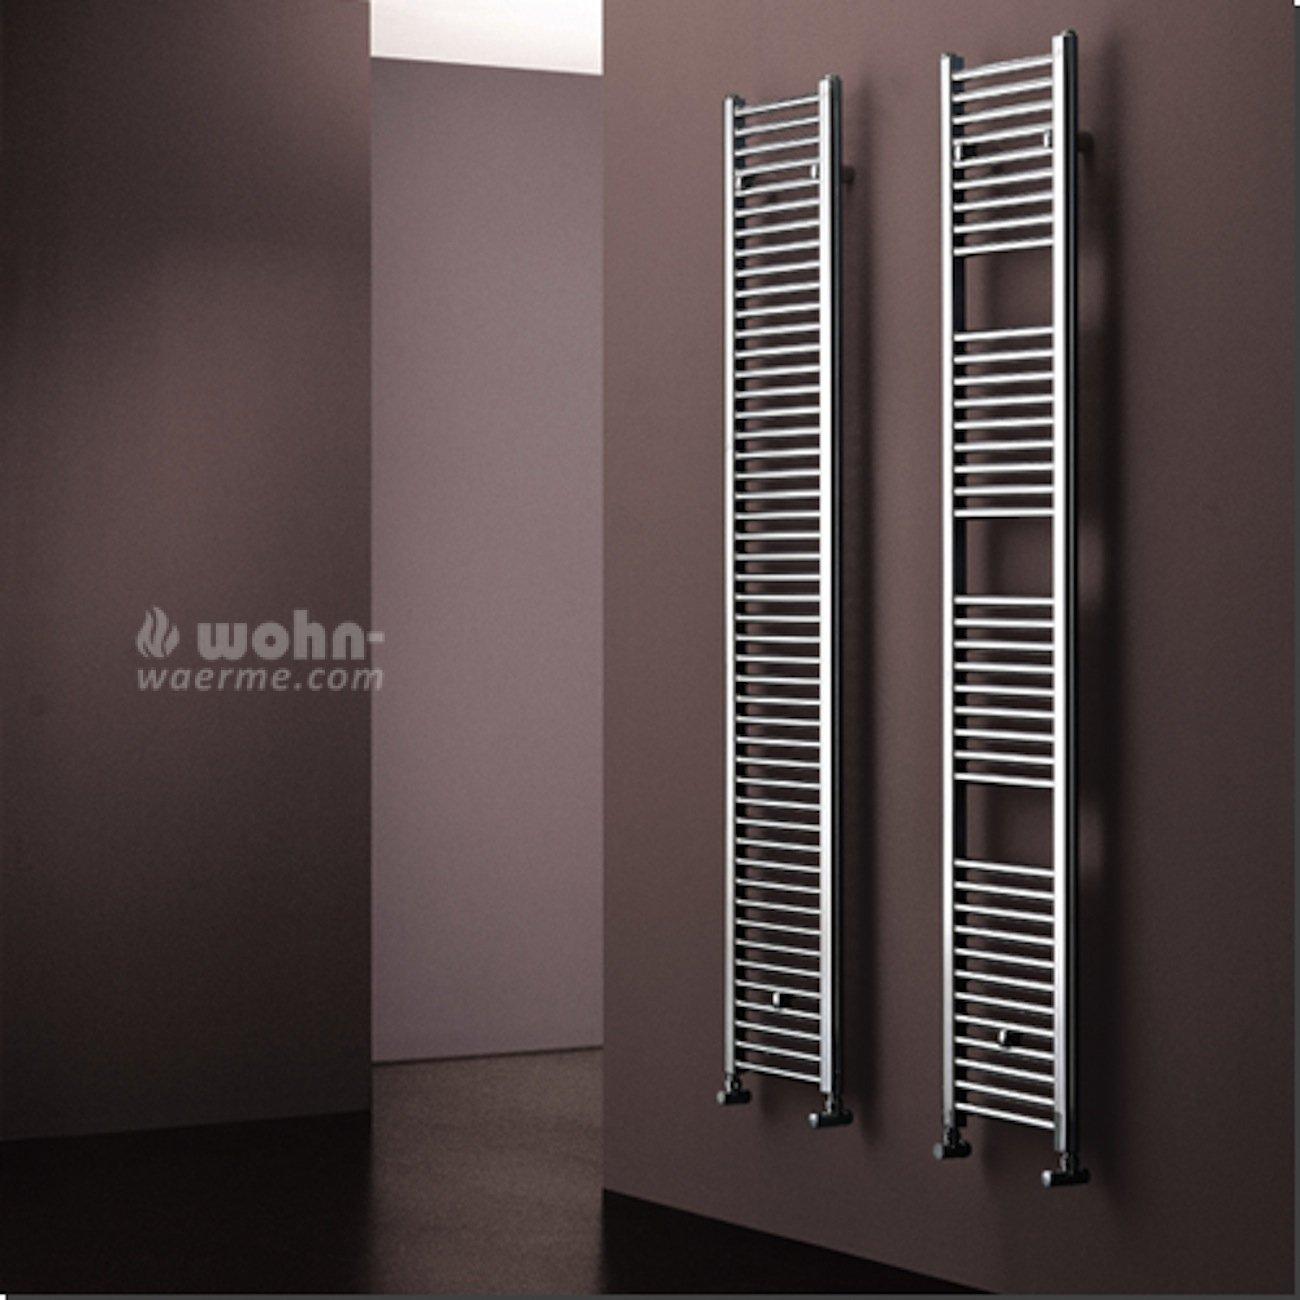 k8 radiatori hts handtuchtrockner f r den kleinen raum. Black Bedroom Furniture Sets. Home Design Ideas